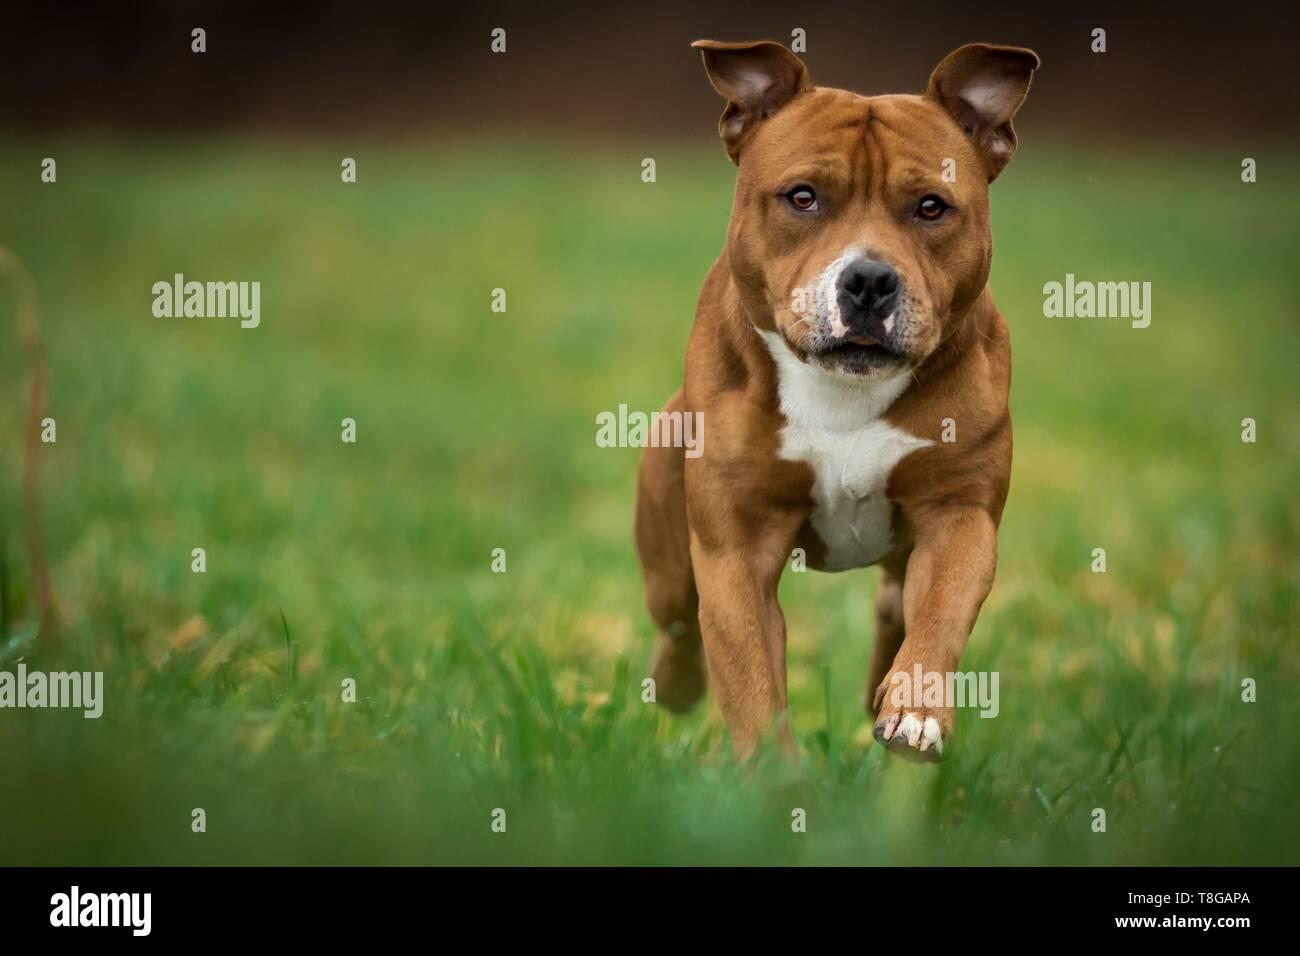 running Staffordshire Bullterrier - Stock Image